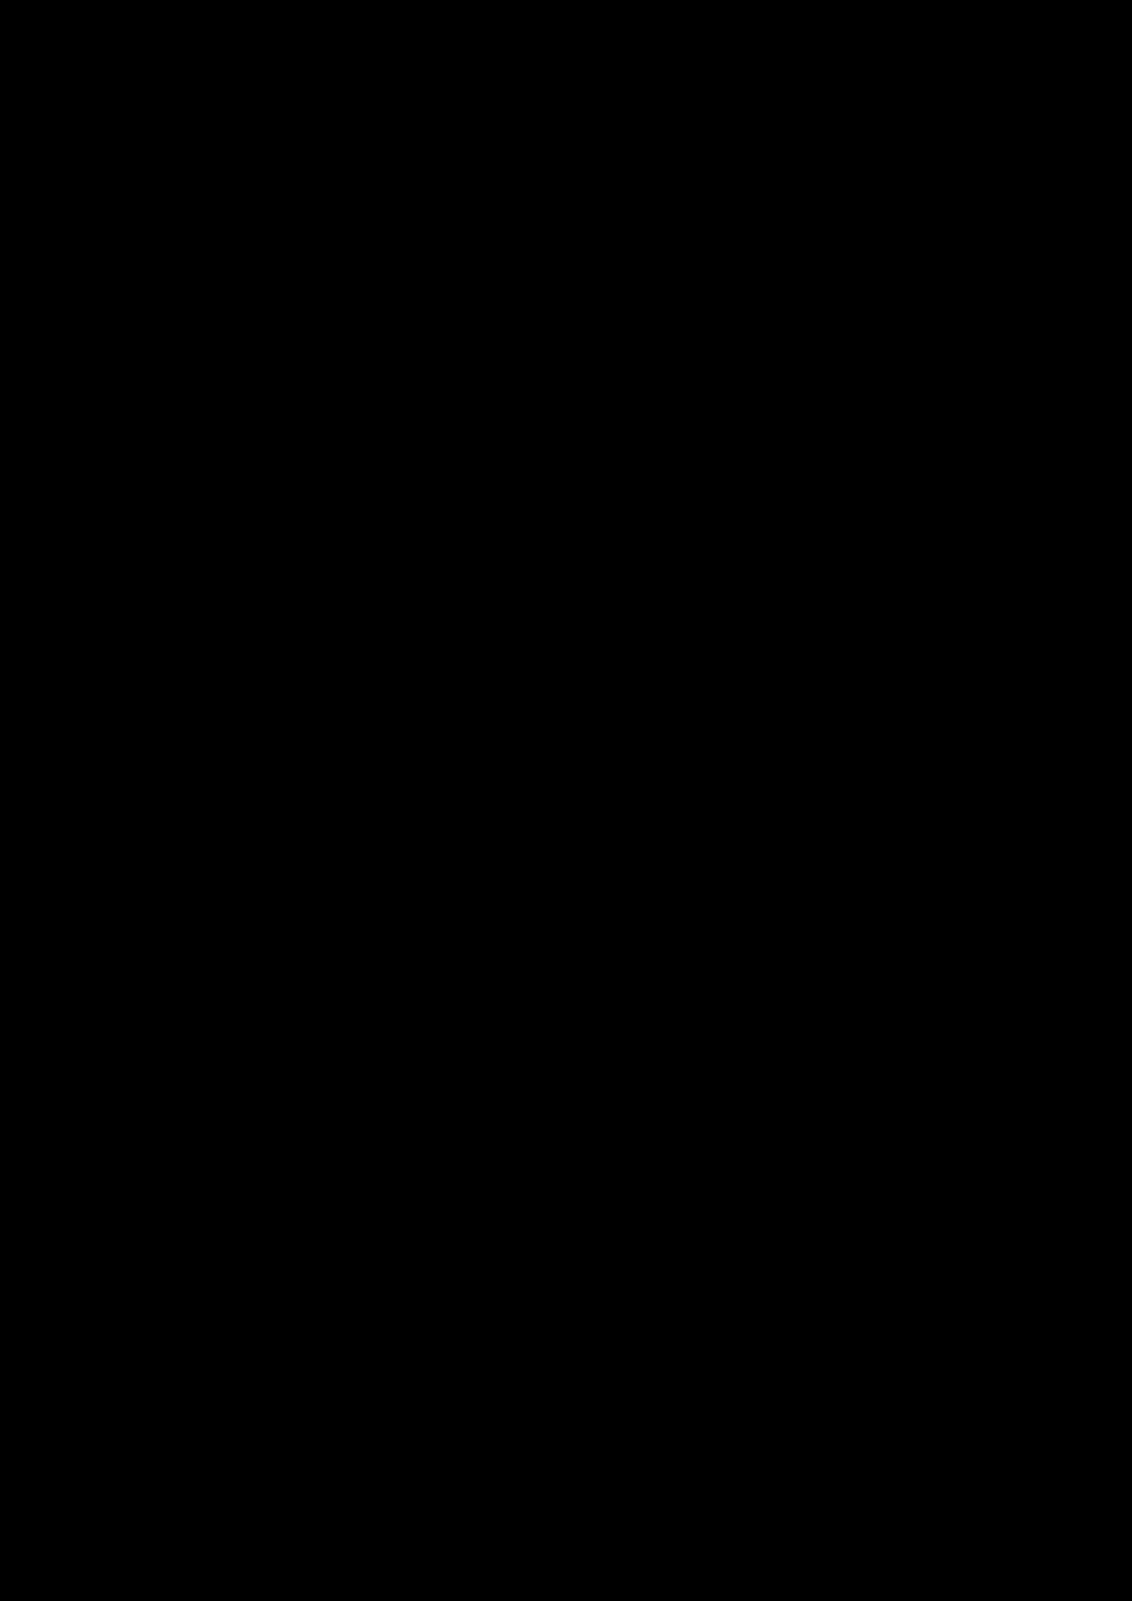 Ten lyubvi slide, Image 44